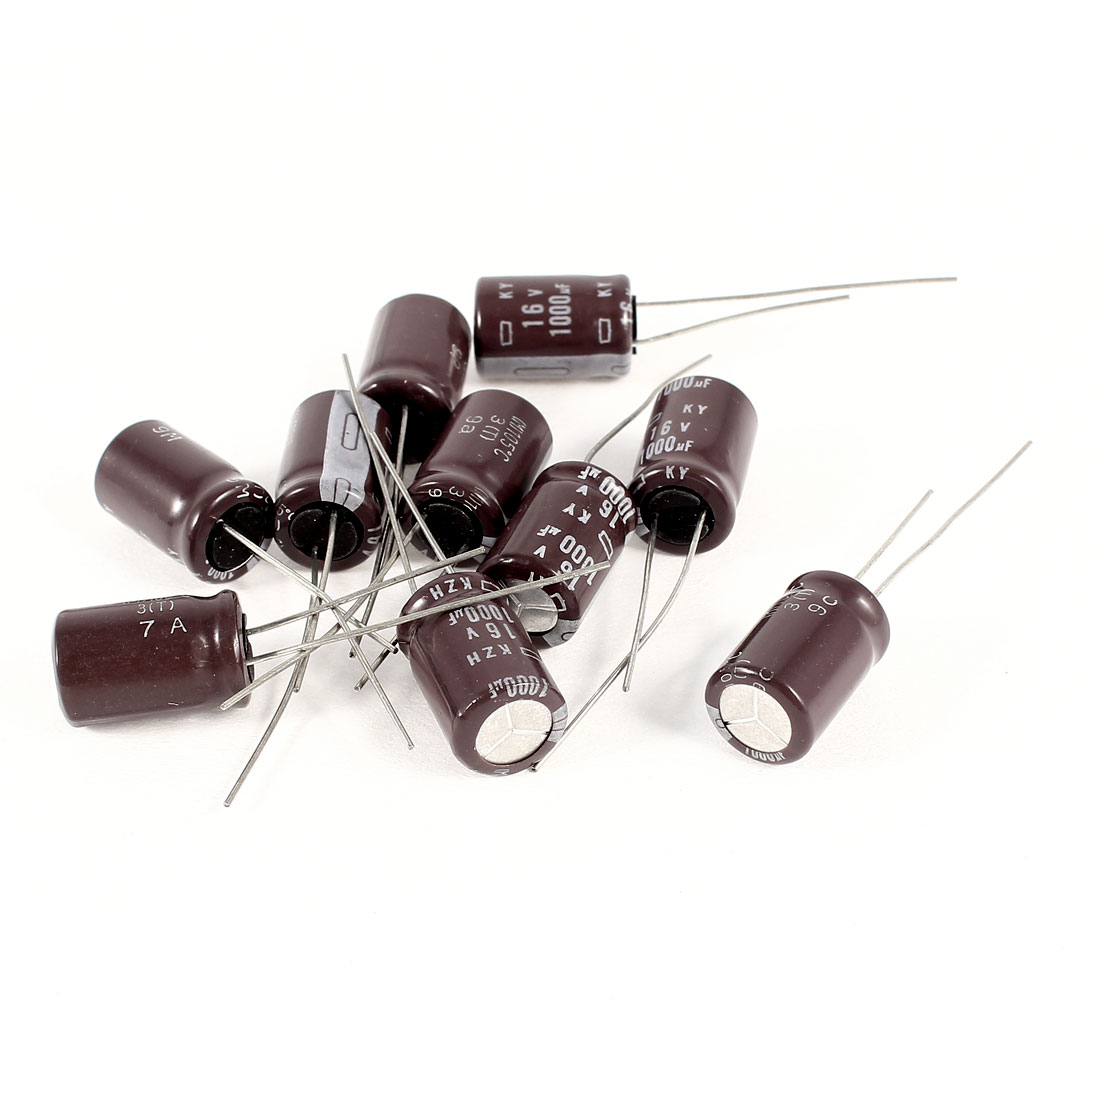 10 Pcs 1000uF 16V Radial Leads Aluminum Electrolytic Capacitors 10x16mm